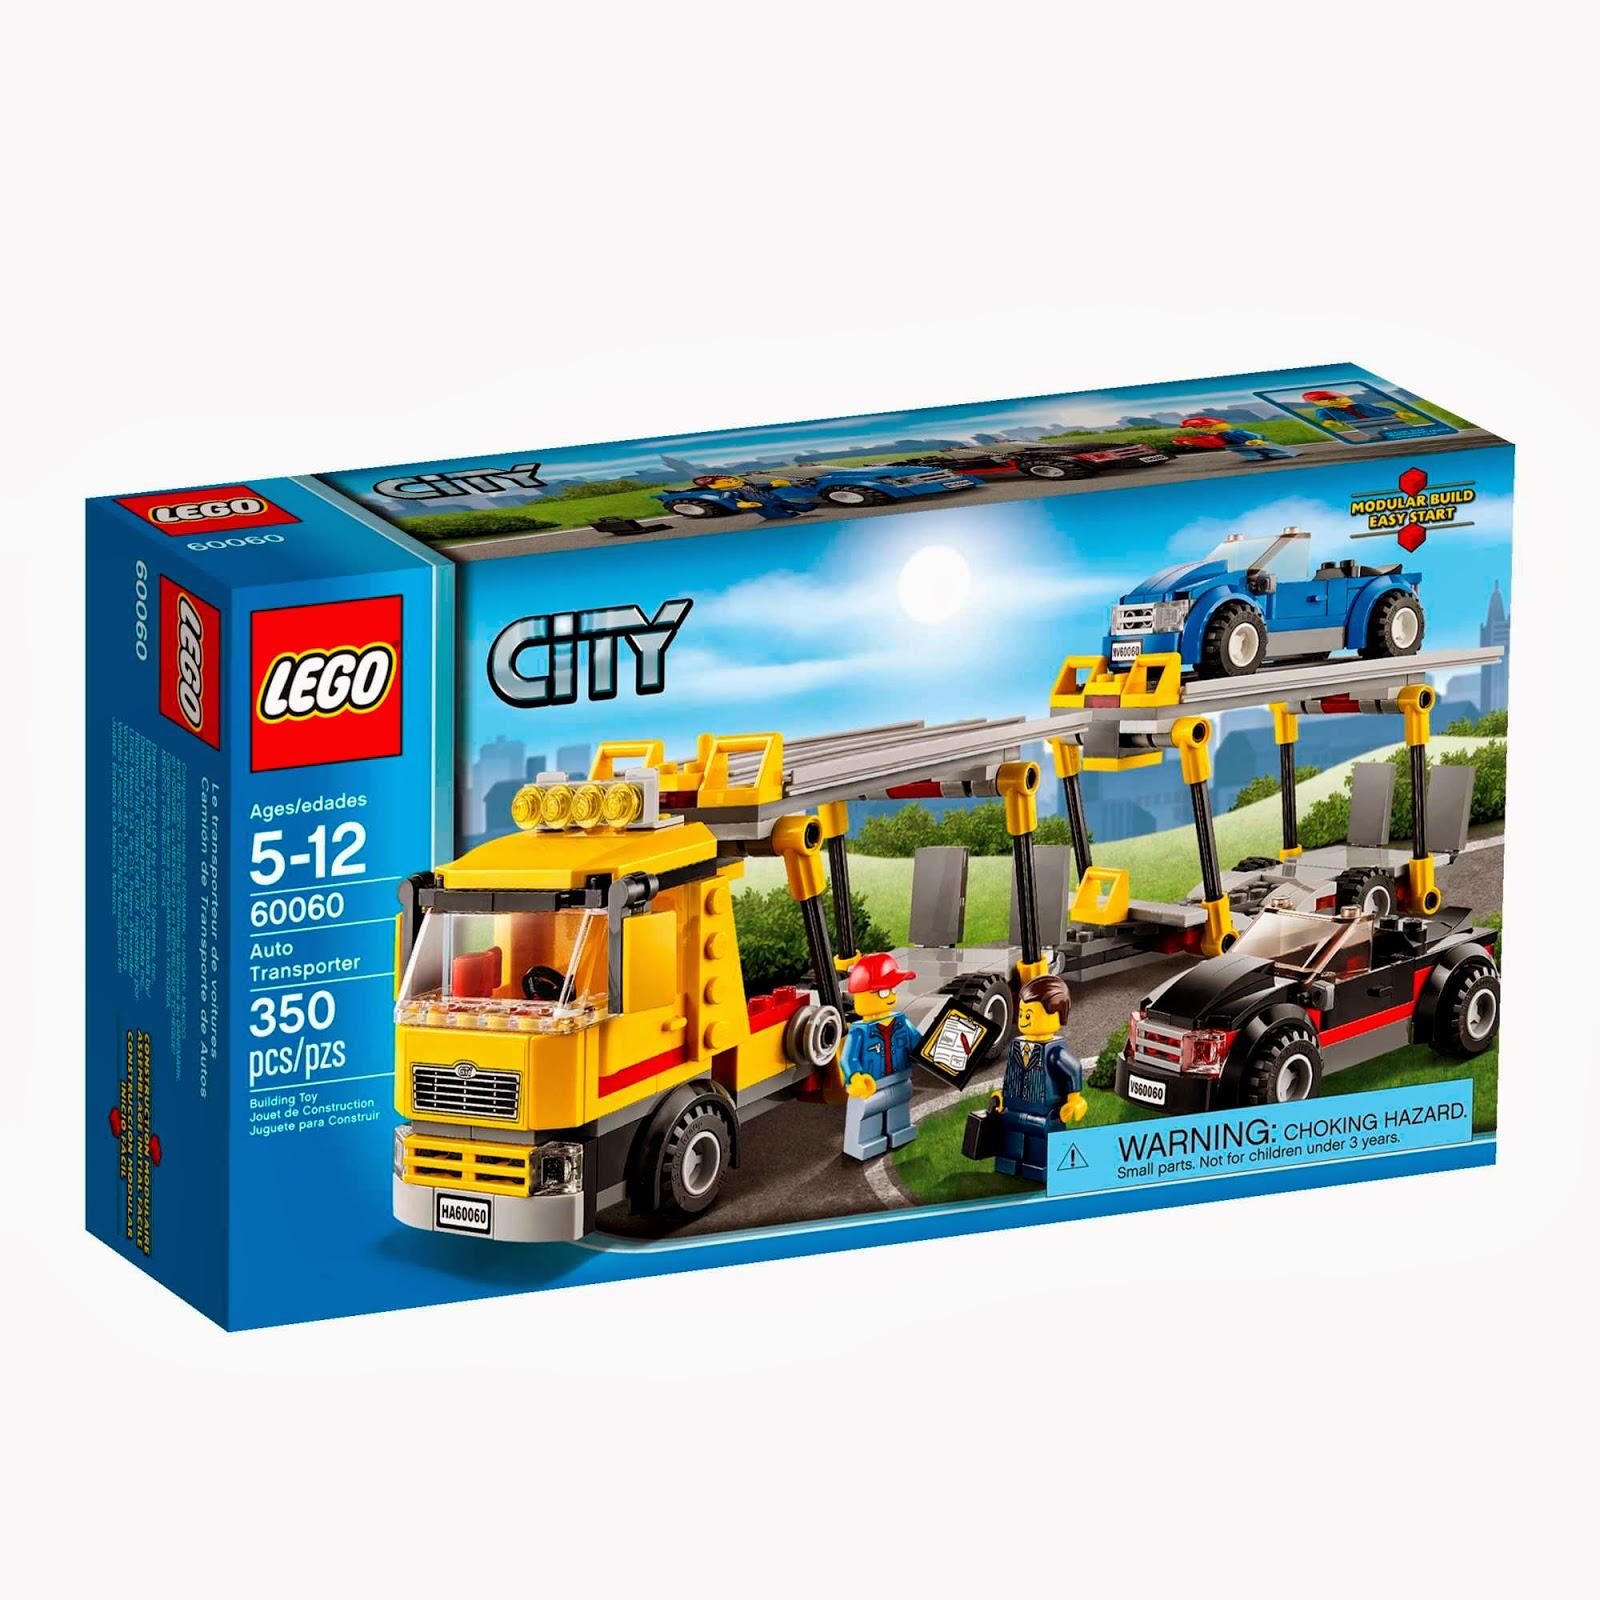 Do choi Lego 60060 - Nguoi van chuyen